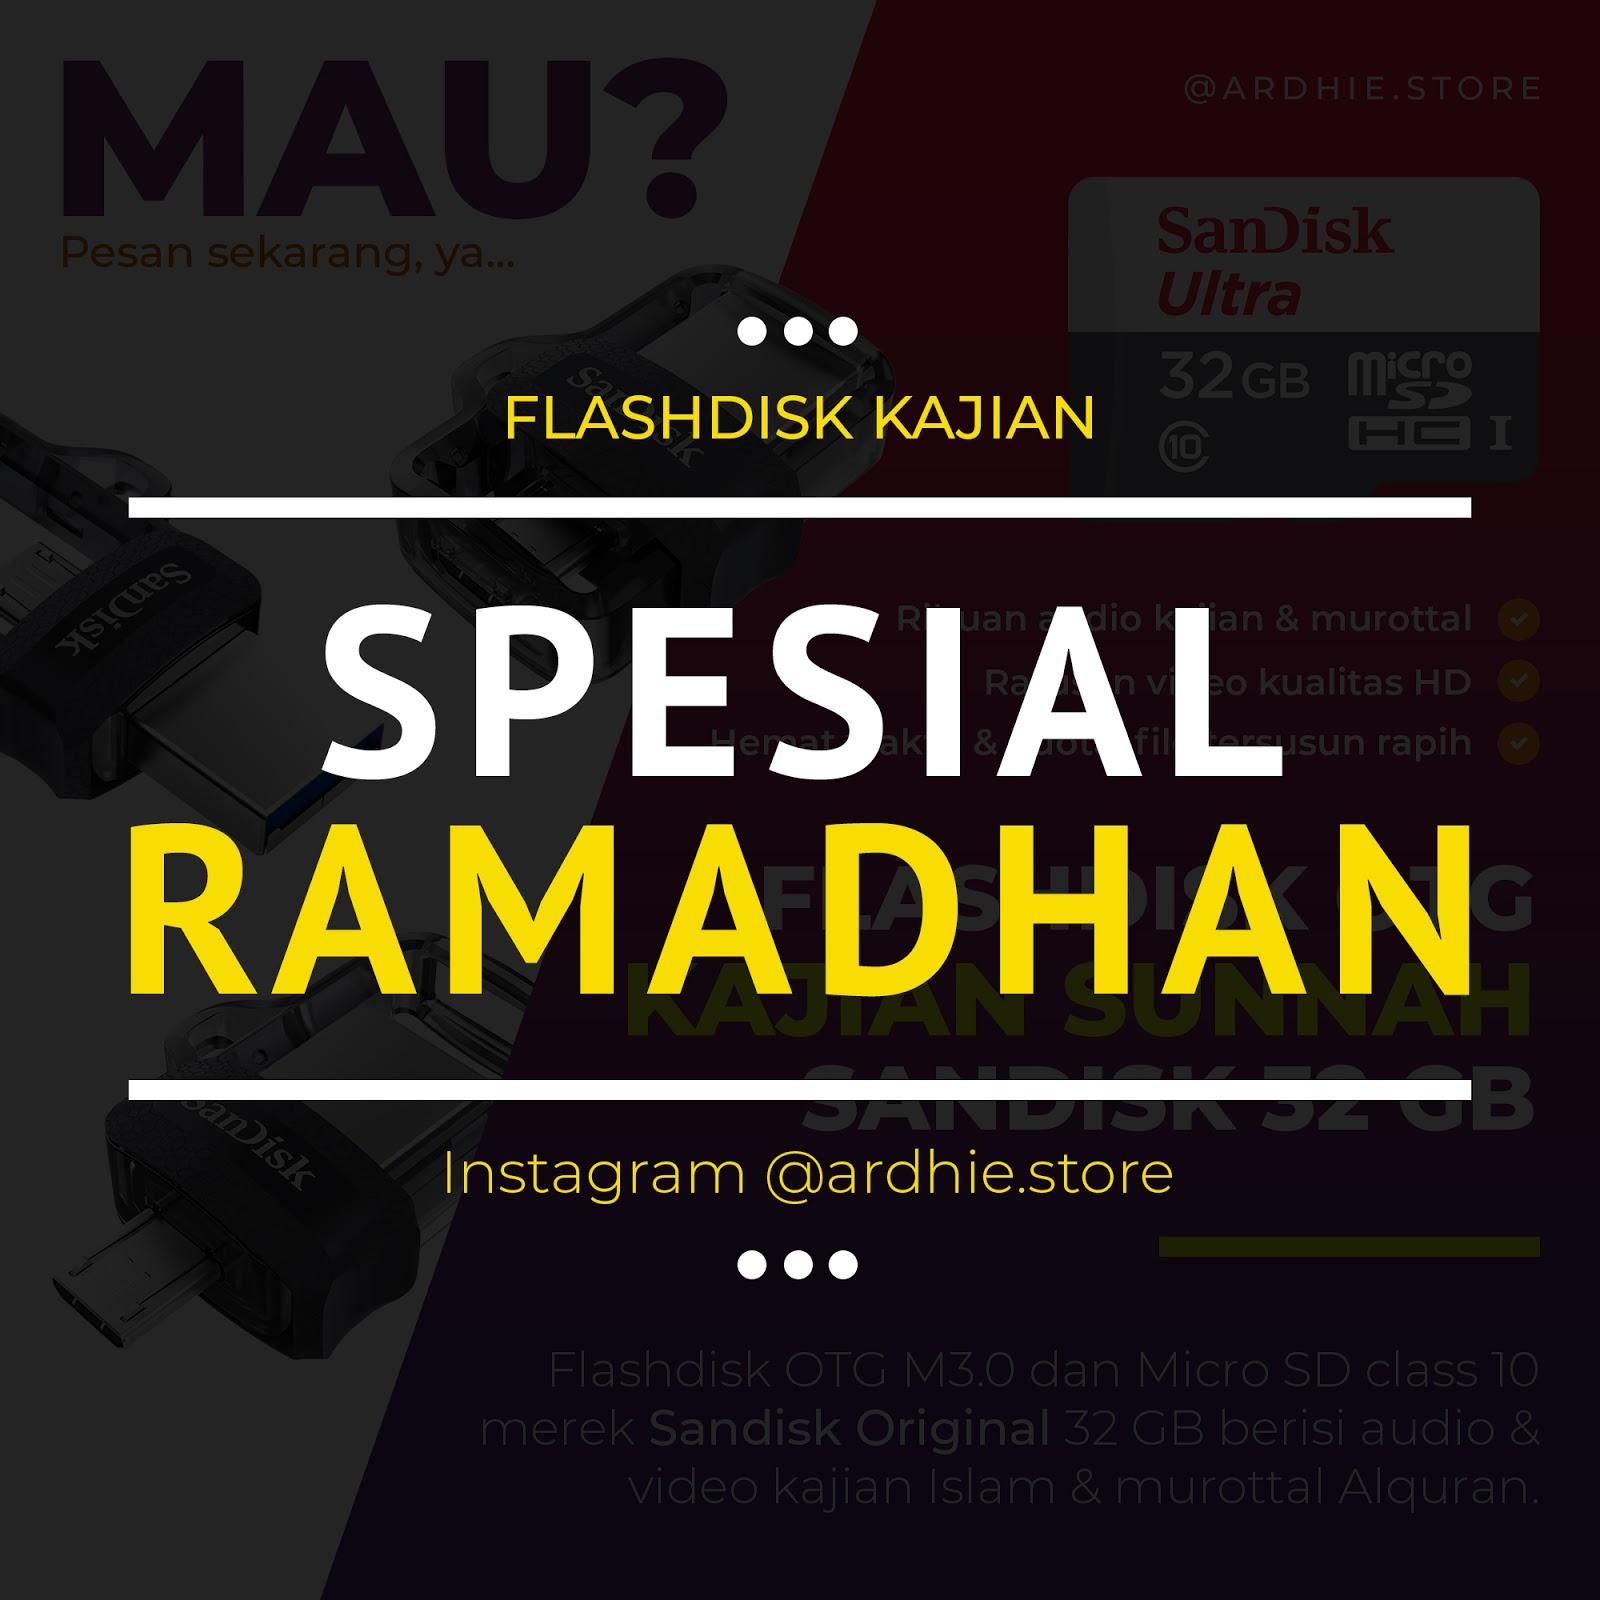 Flashdisk Kajian & Murottal